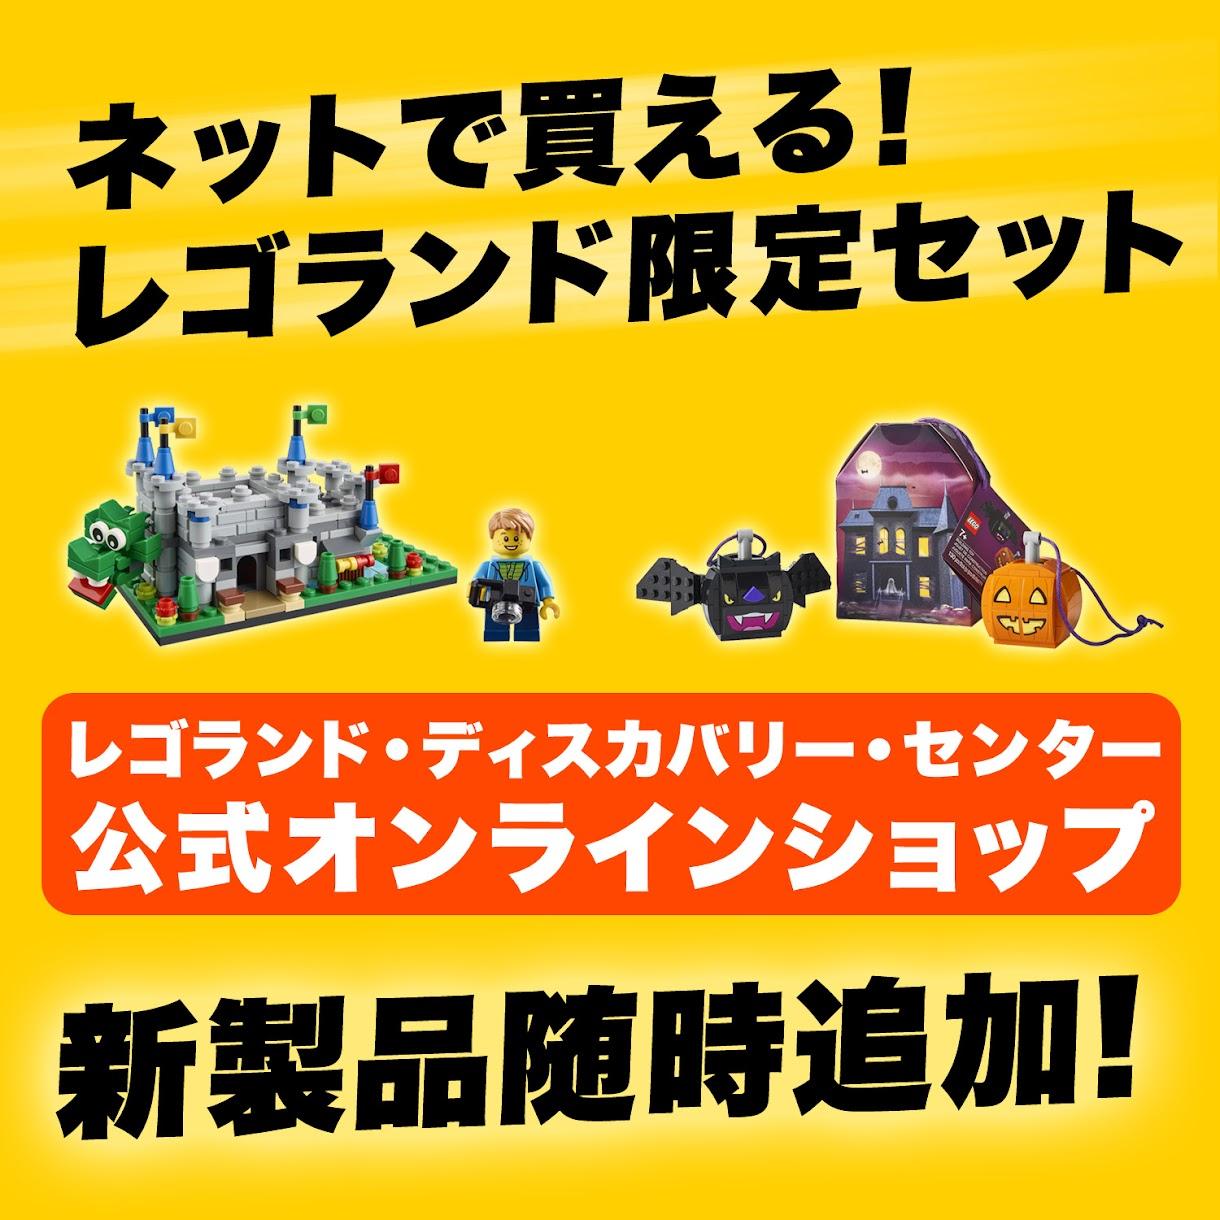 【LDC公式オンライン】限定商品も通常セットも買える!レゴランド・ディスカバリー・センター公式ショップをチェック!